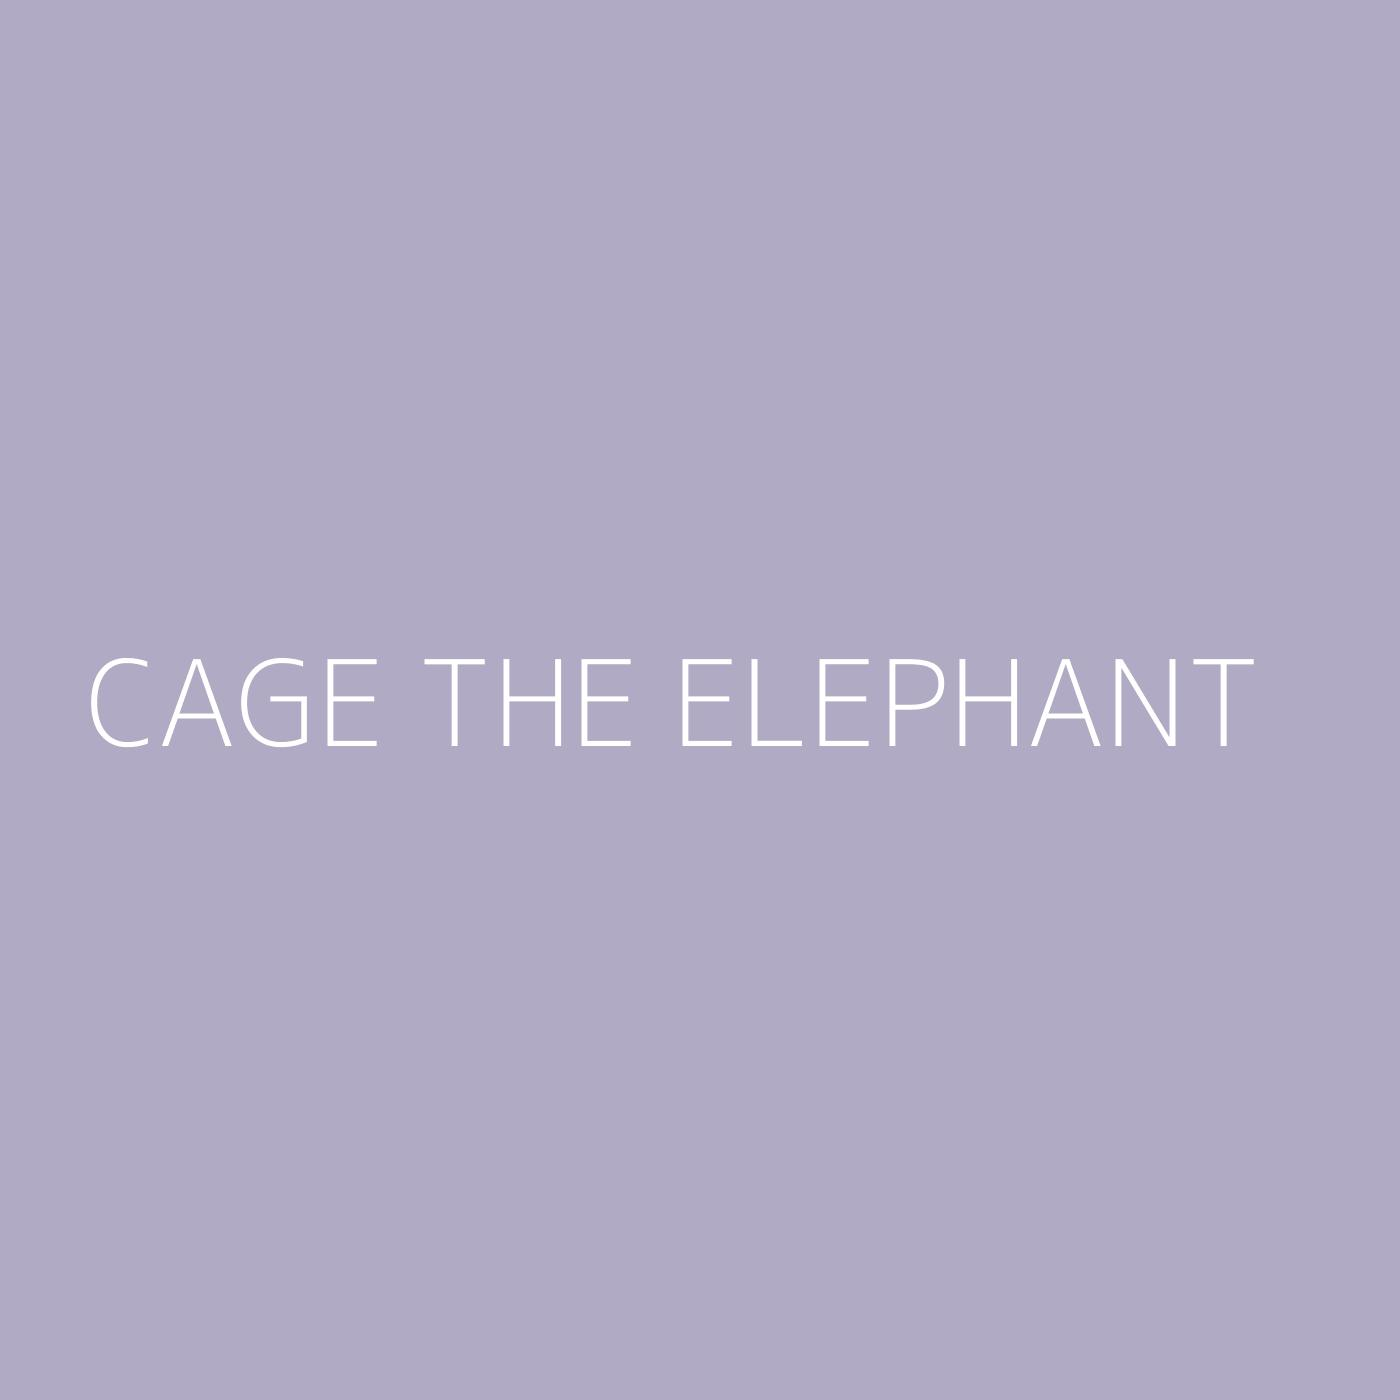 Cage The Elephant Playlist Artwork